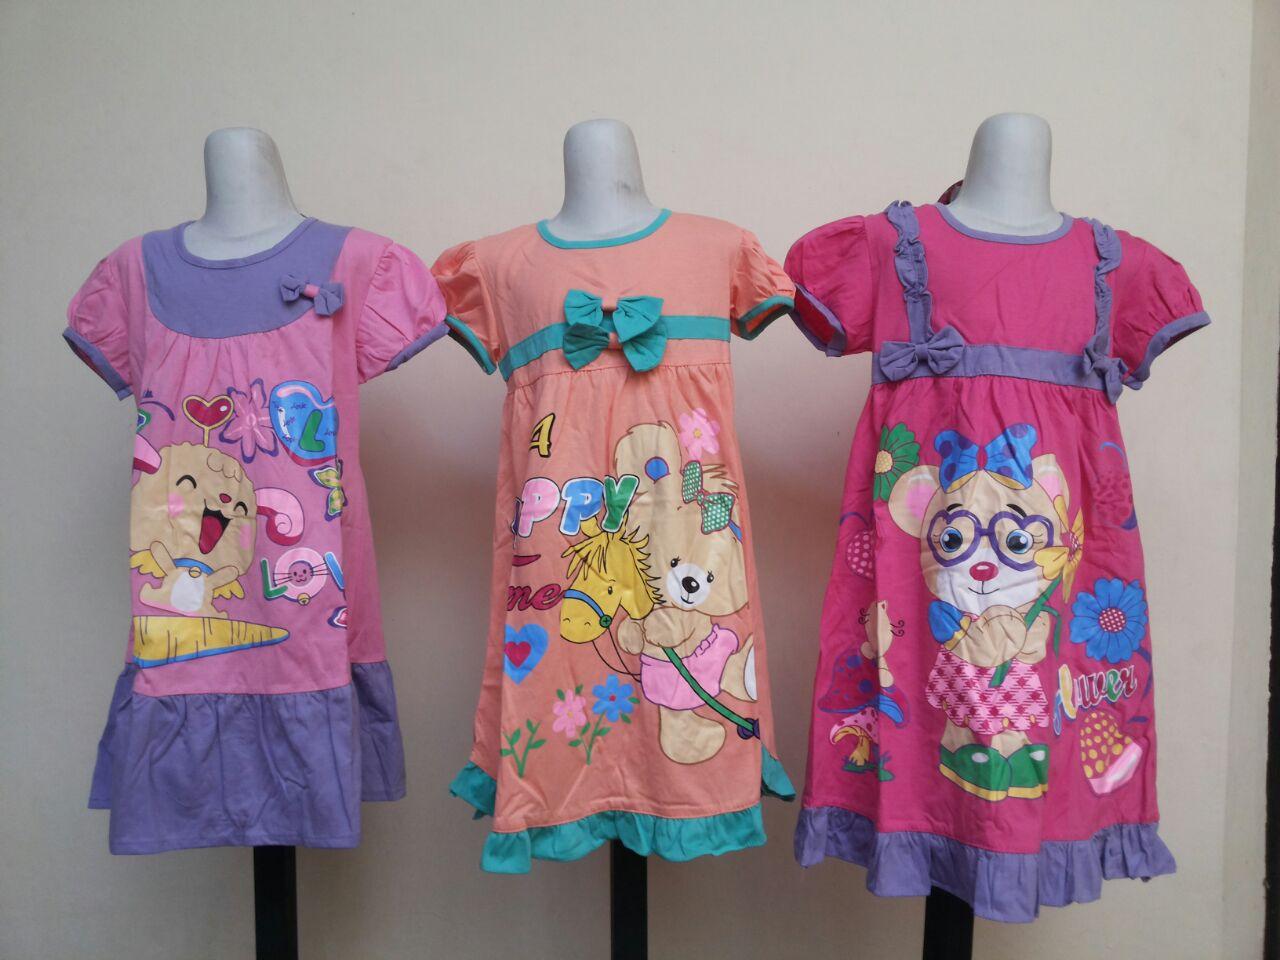 Grosiran Murah di Bandung Pusat Grosir Dress Vanessa Karakter Anak Perempuan Murah 25Ribu